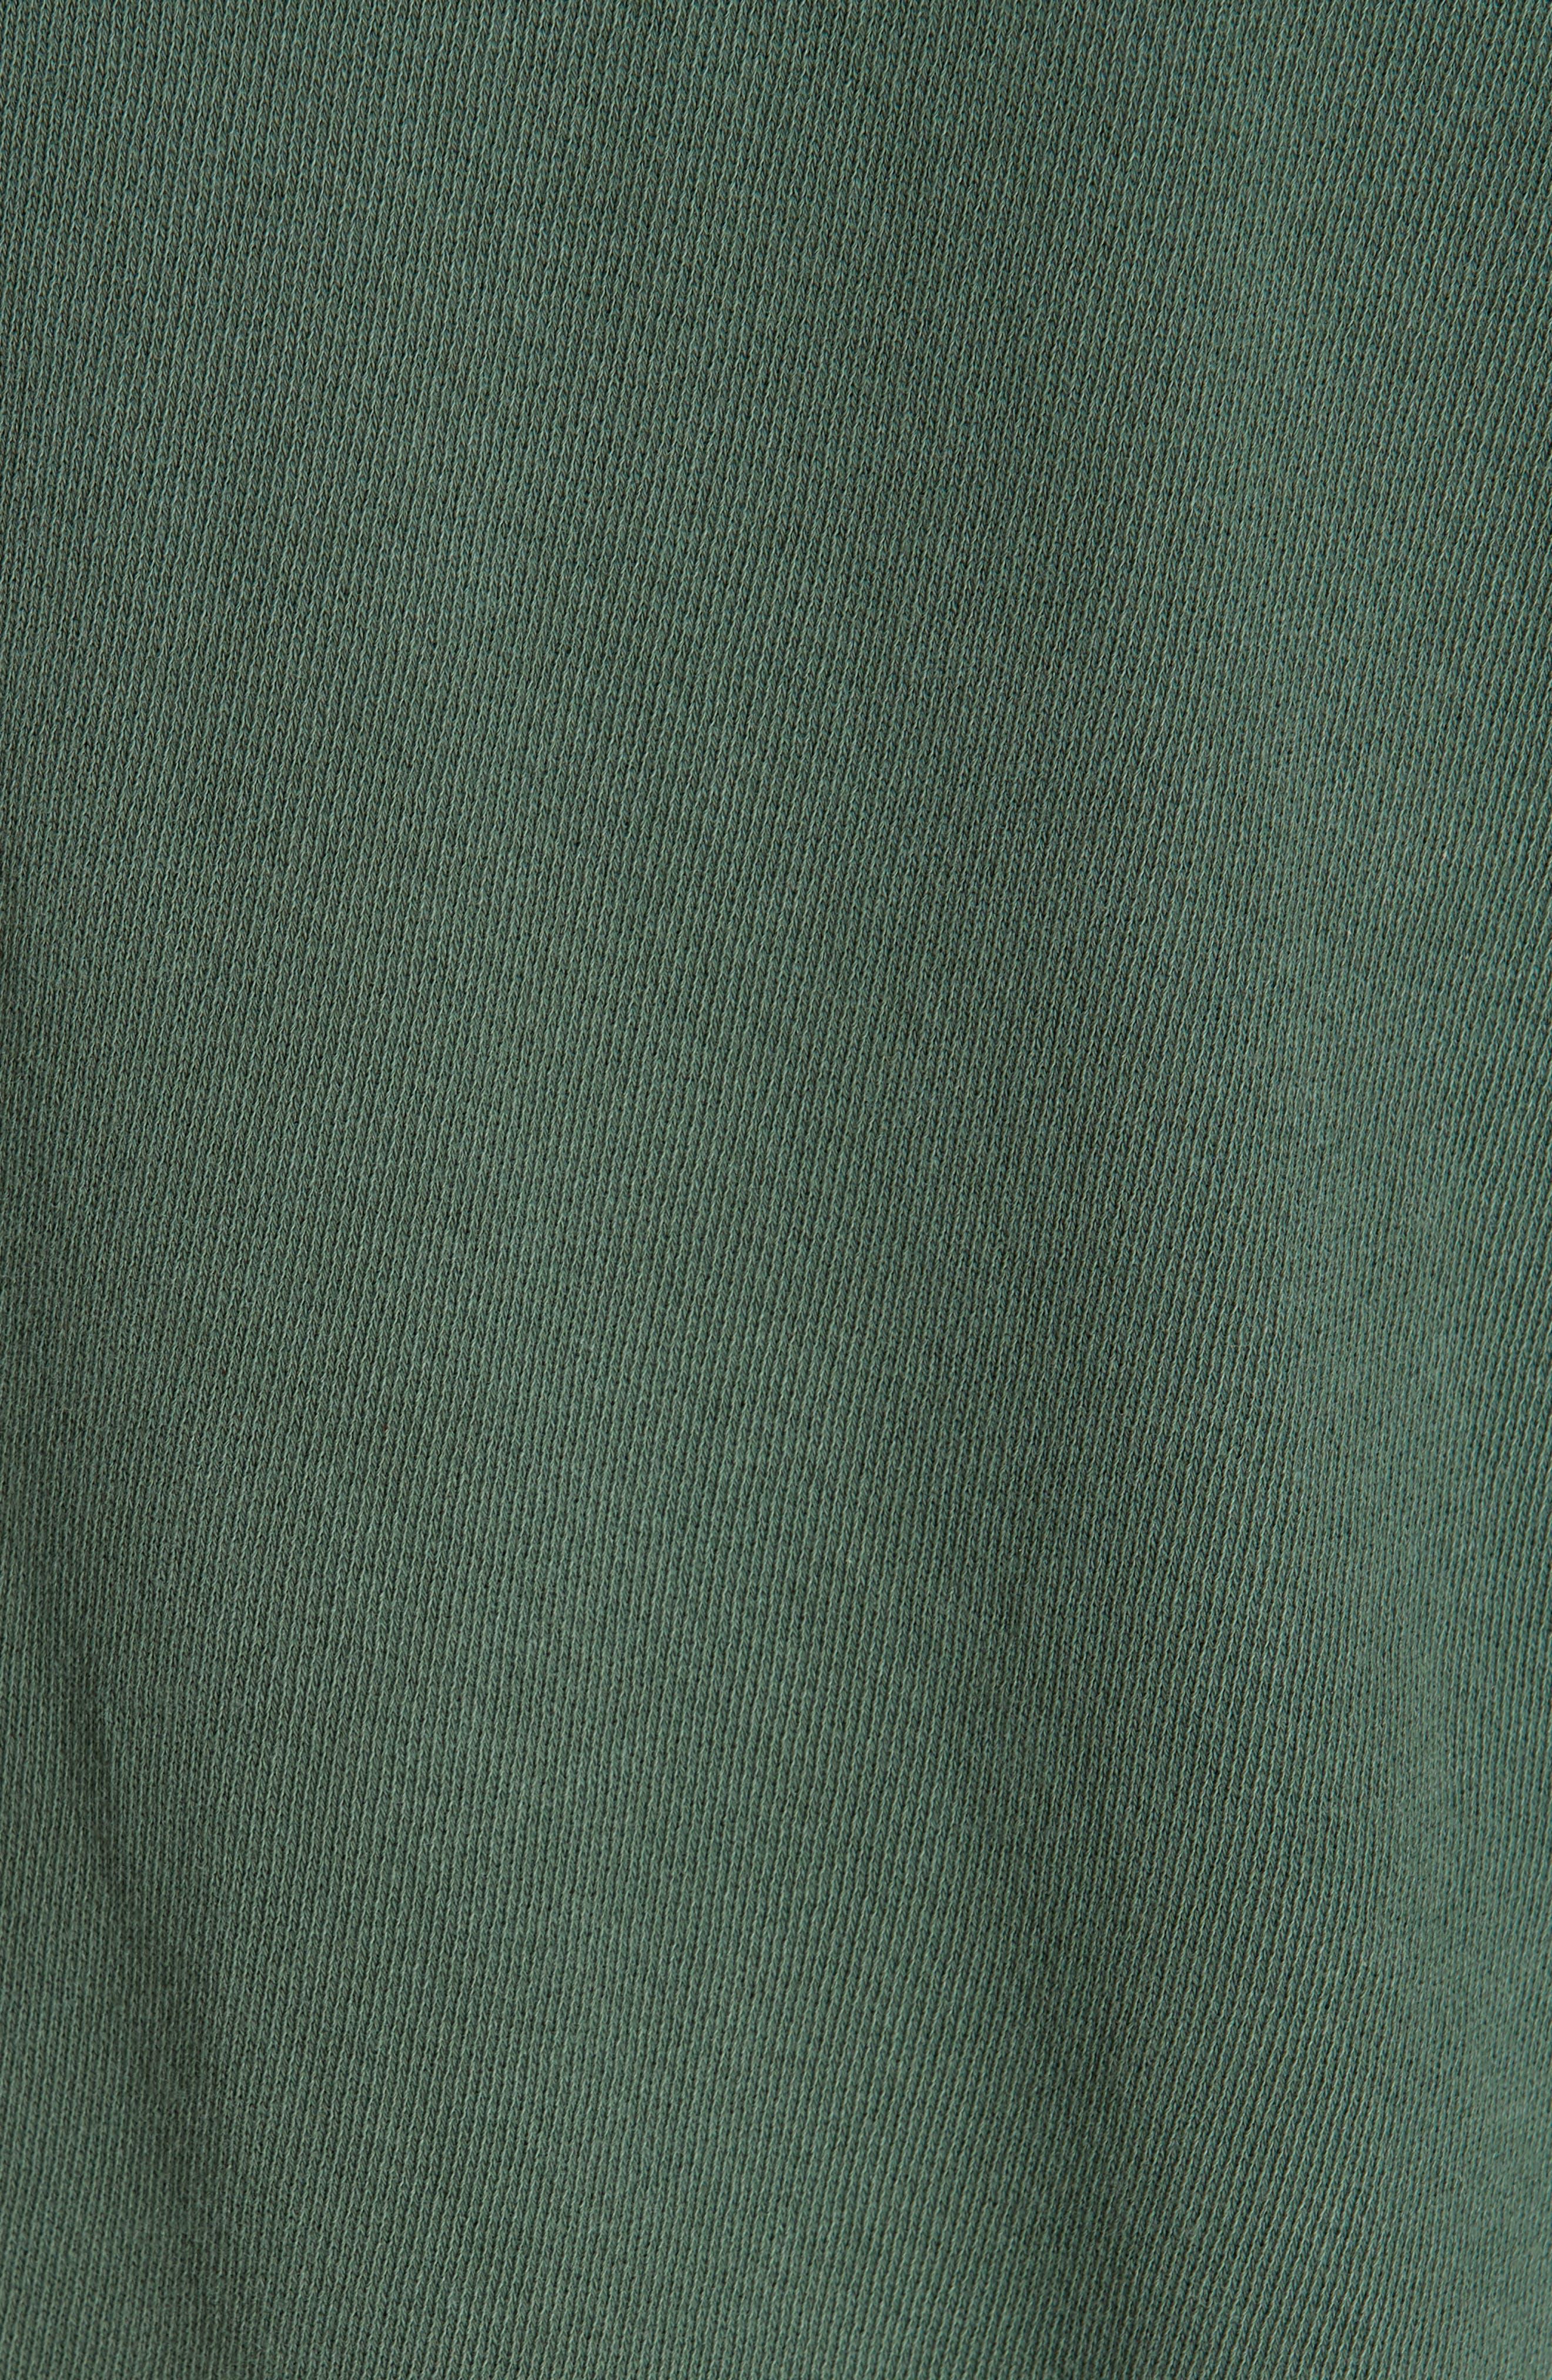 The Bishop Sleeve Sweatshirt,                             Alternate thumbnail 5, color,                             PINE